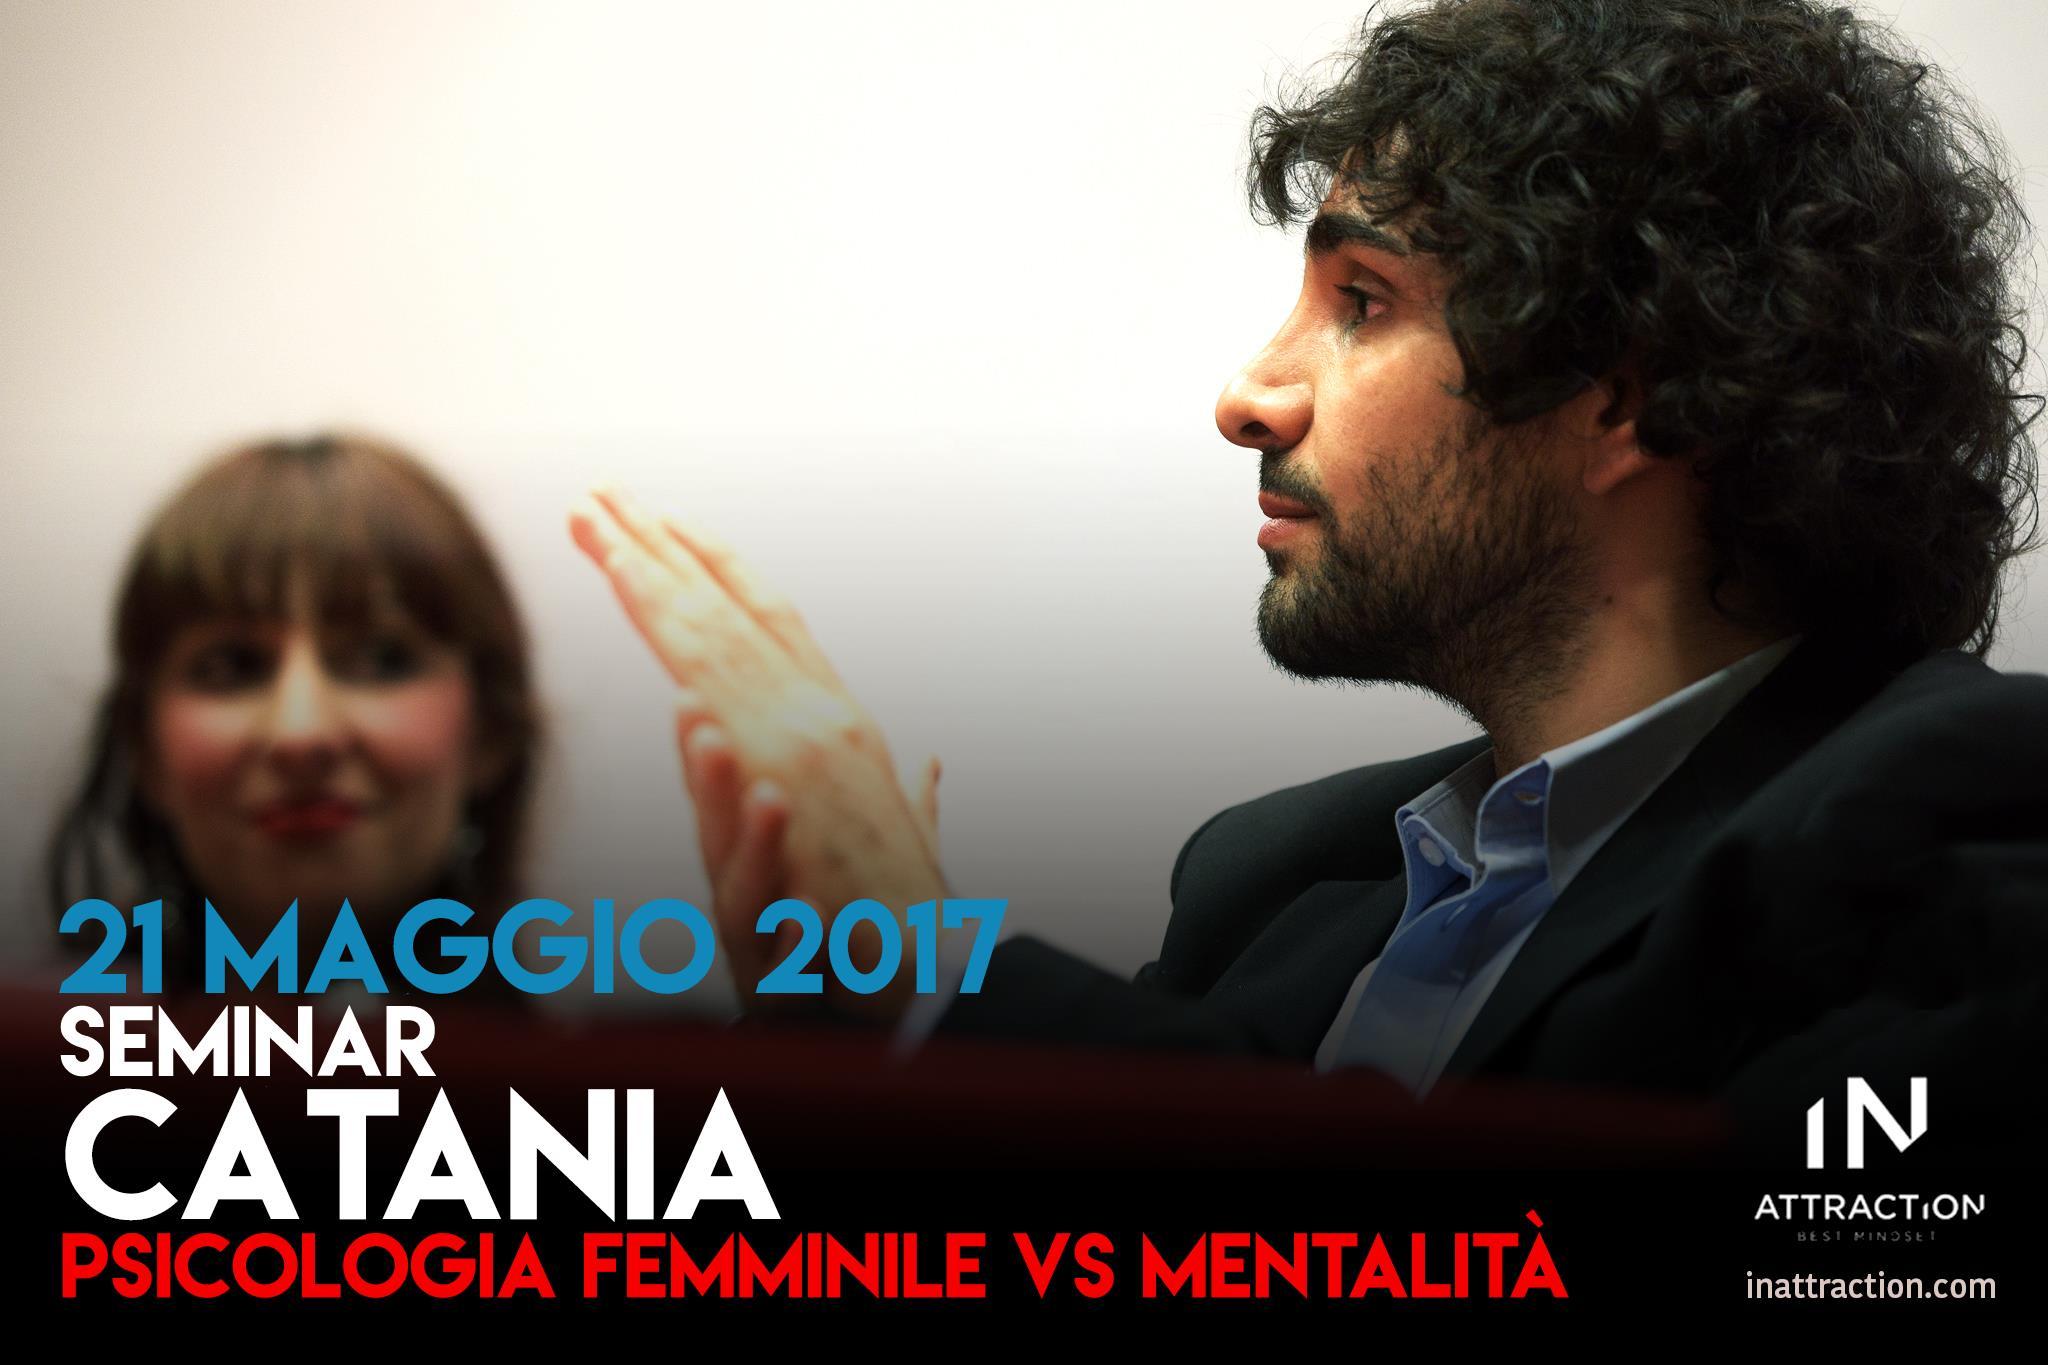 seminario di seduzione catania psicologia femminile